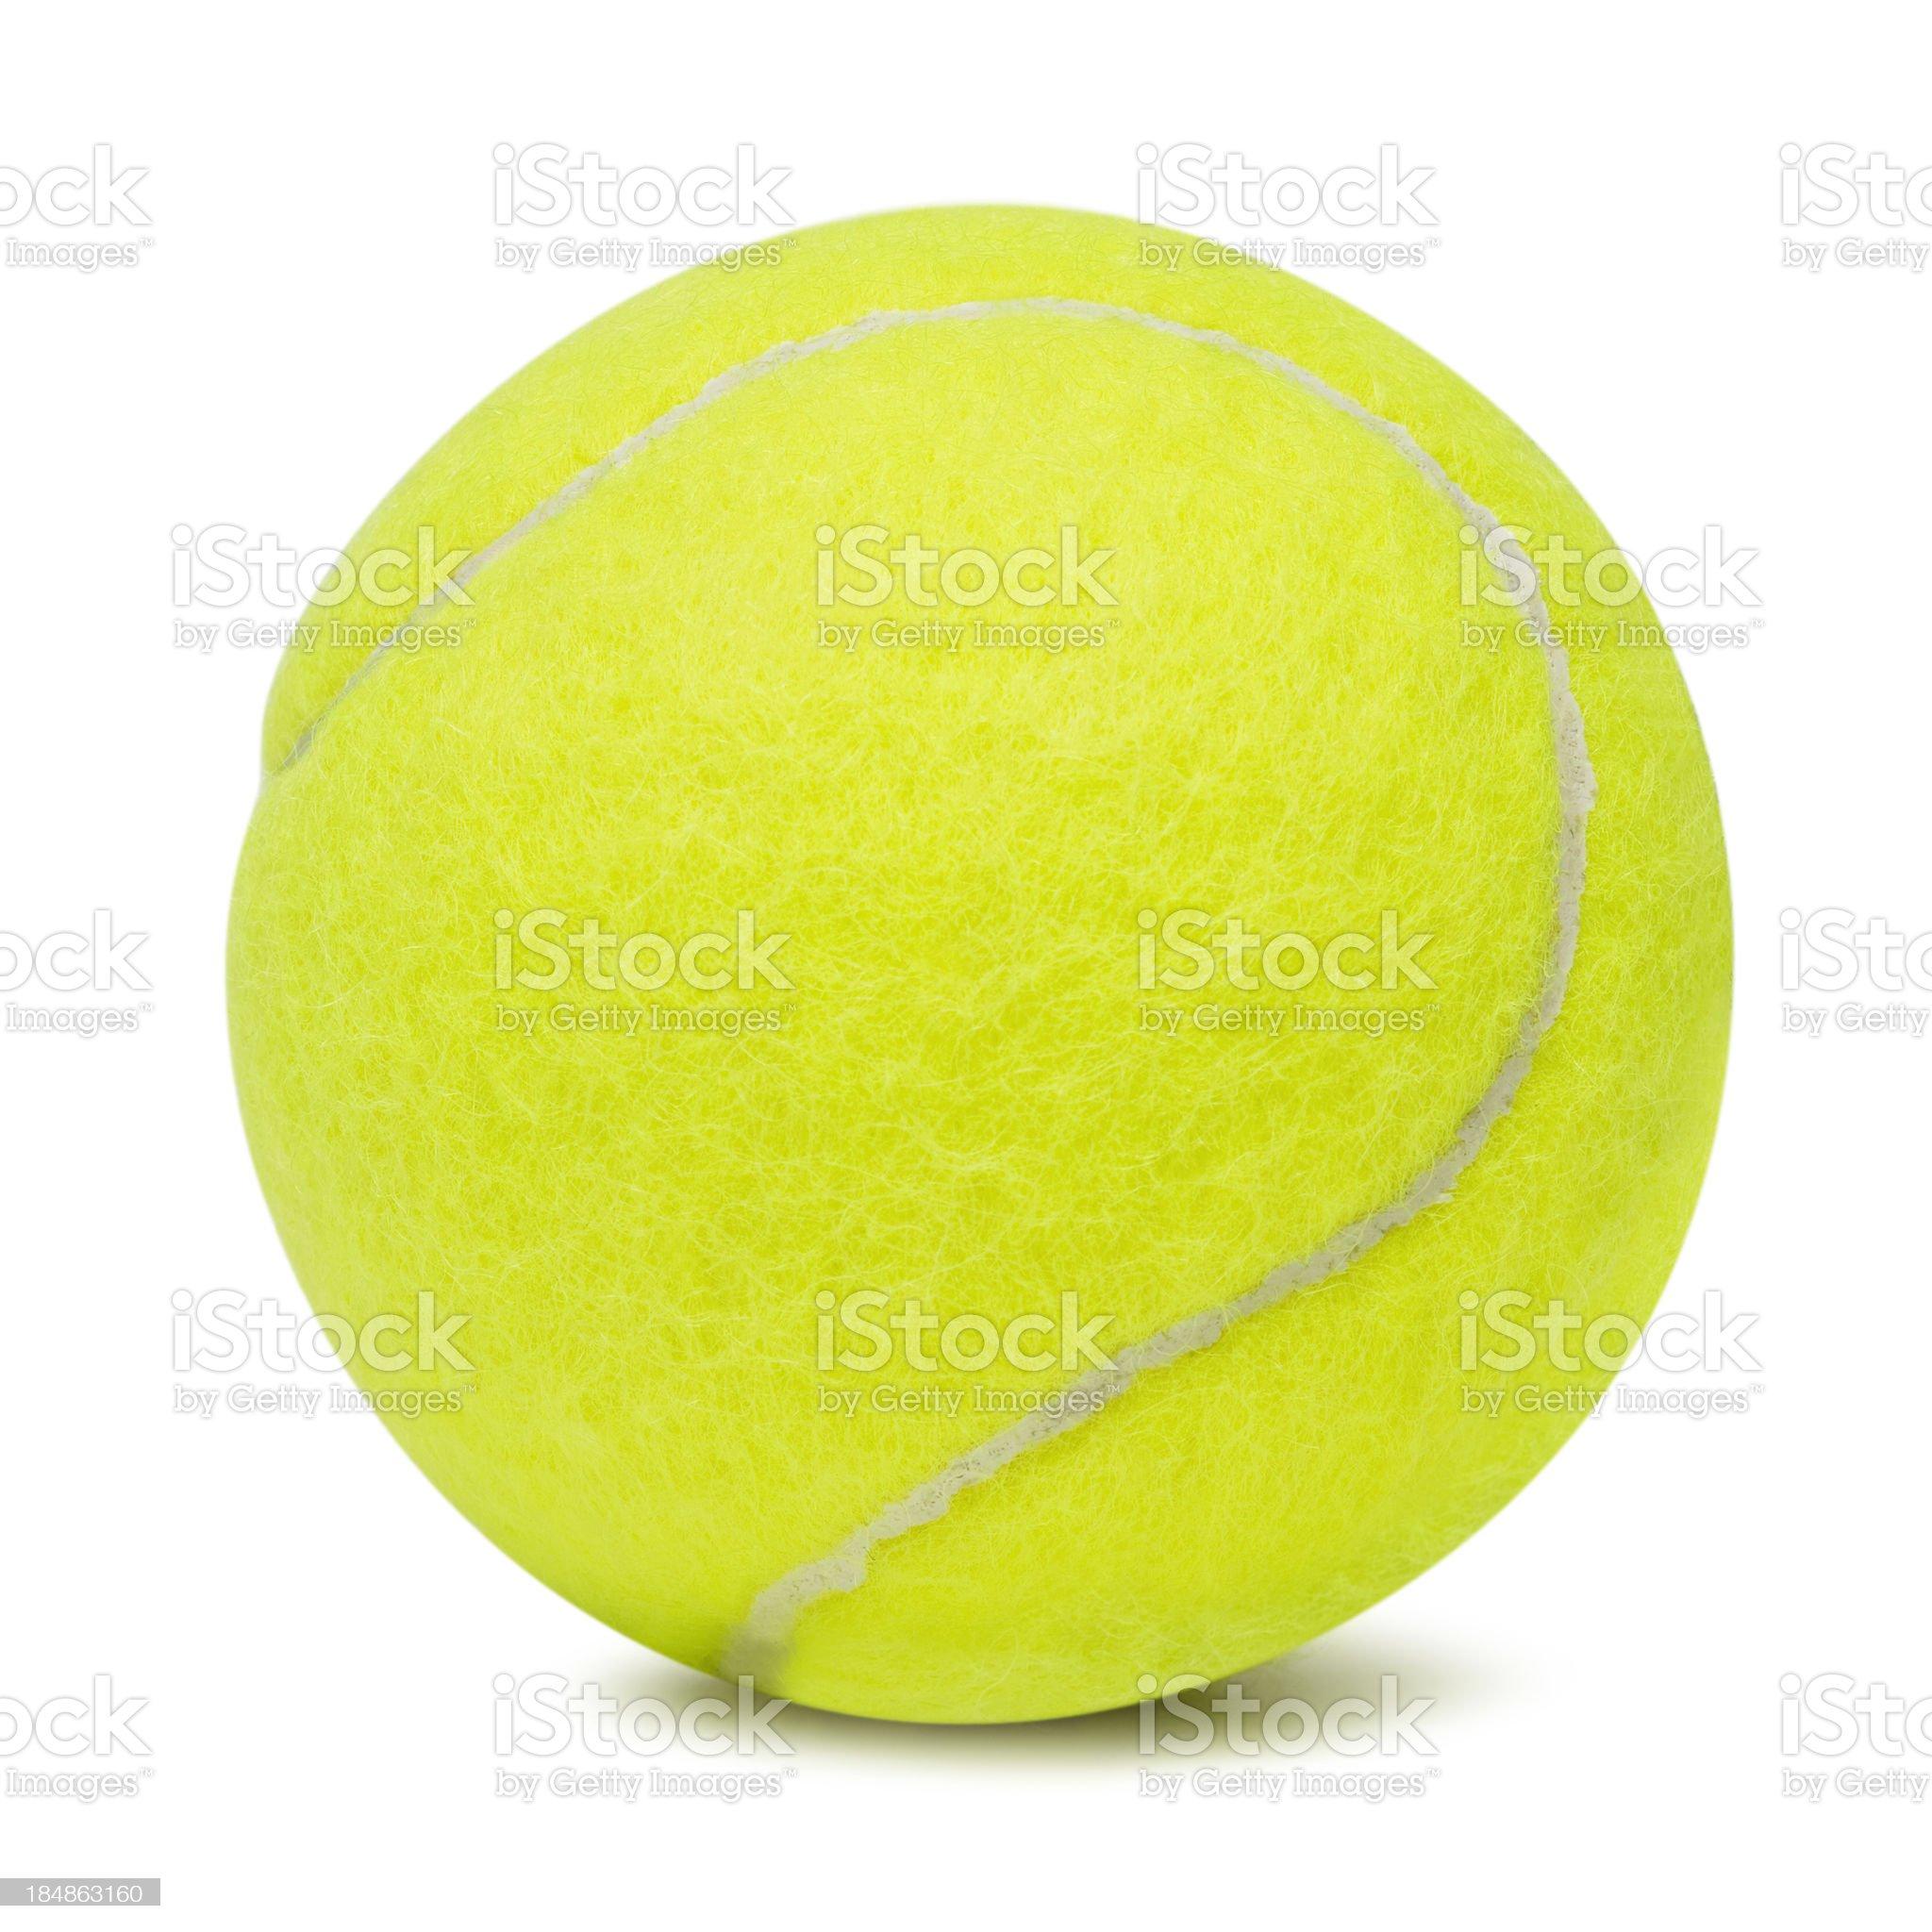 Tennis ball on white background royalty-free stock photo